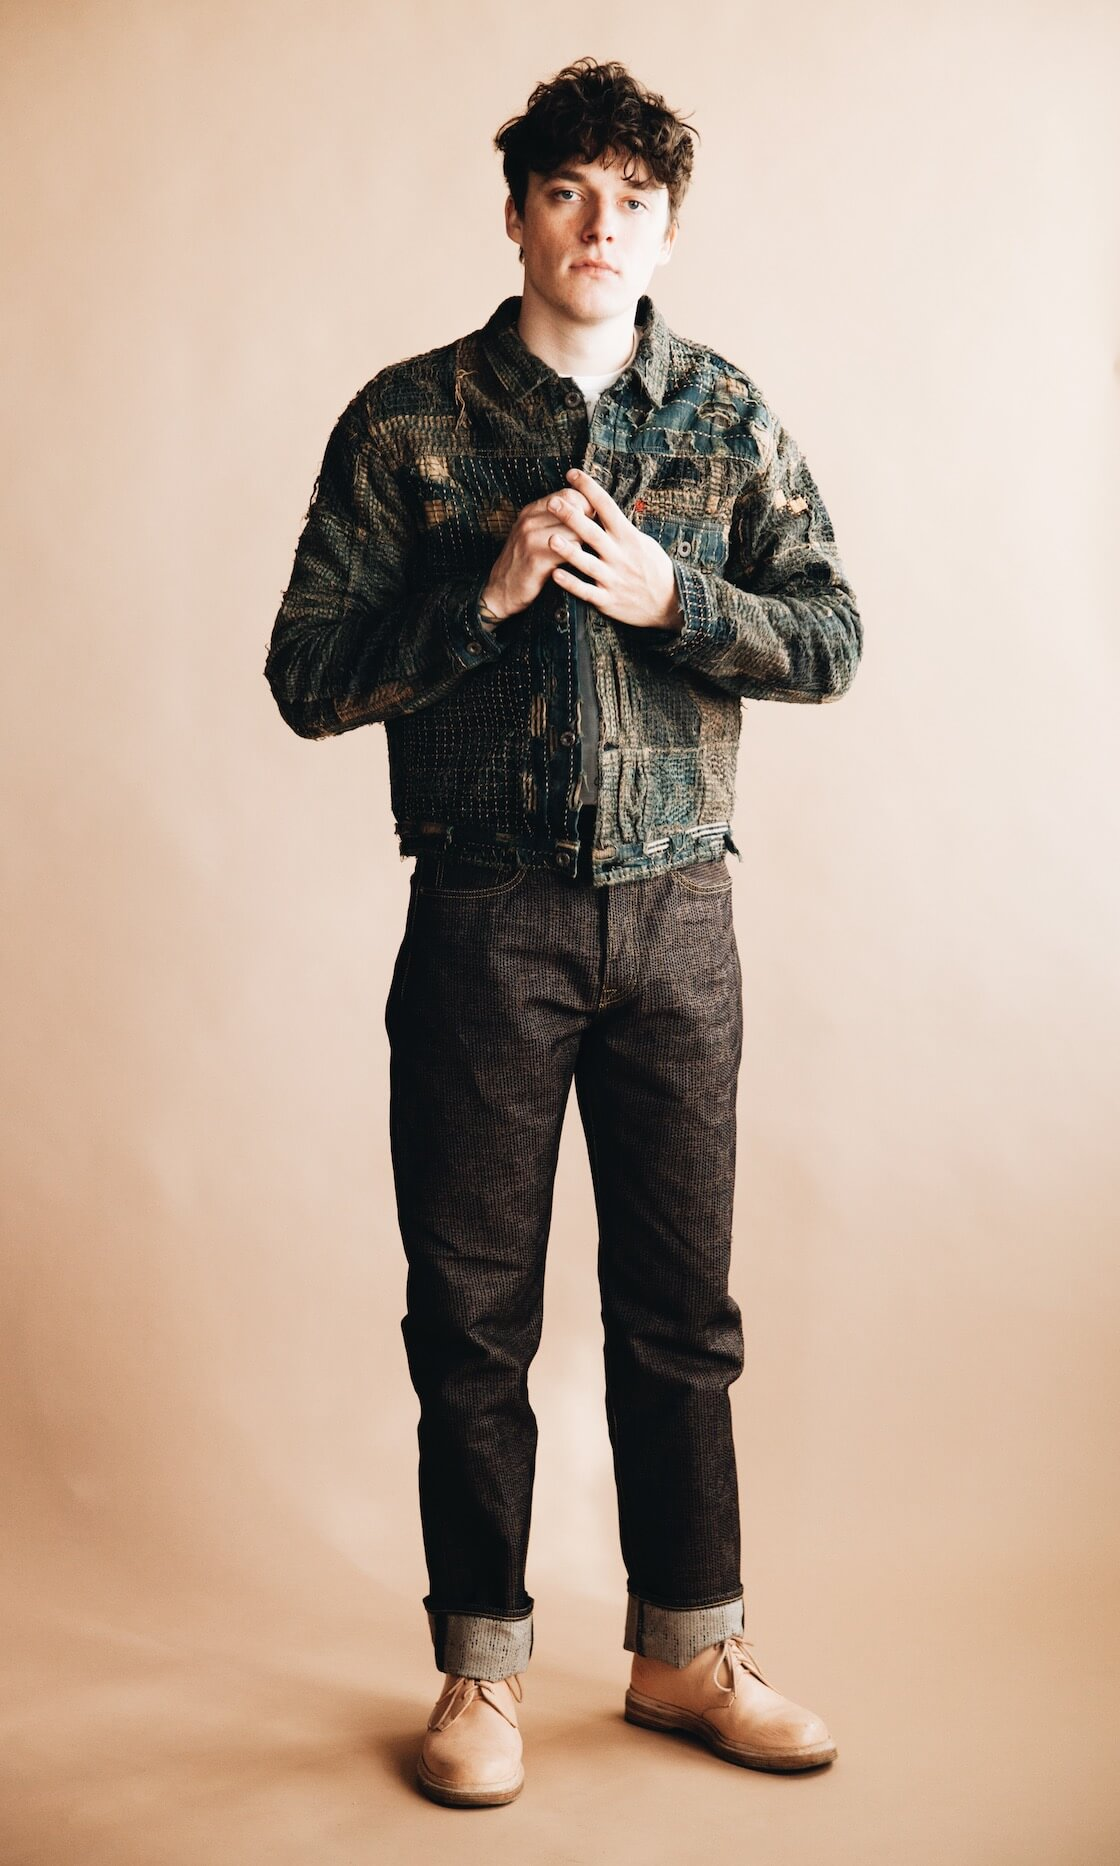 kapital boro 1st jacket, century denim pants, and hender scheme mip 21 shoes on body